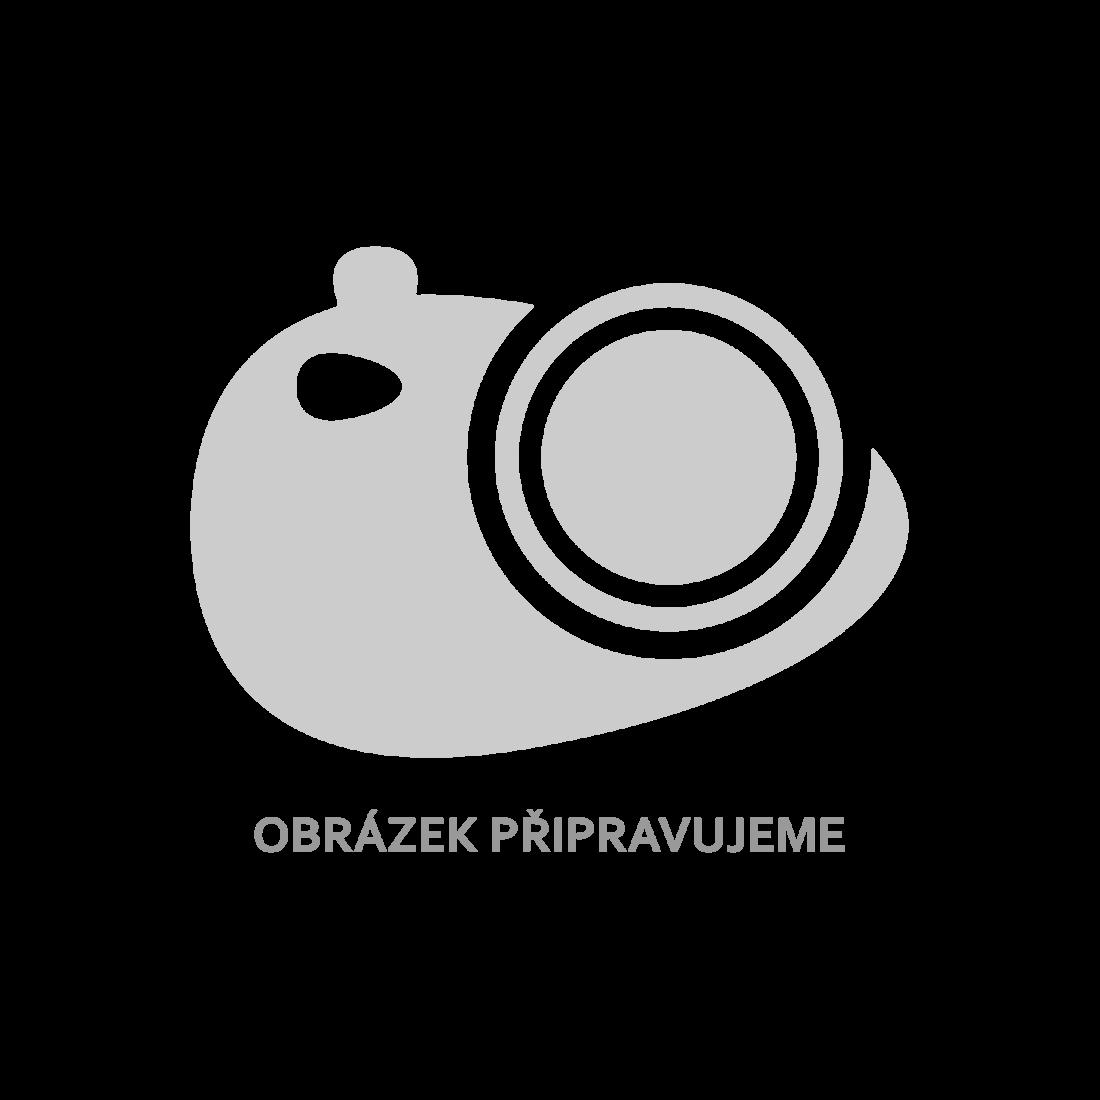 vidaXL Úložný box na LP desky betonově šedý 71x34x36 cm dřevotříska [800121]